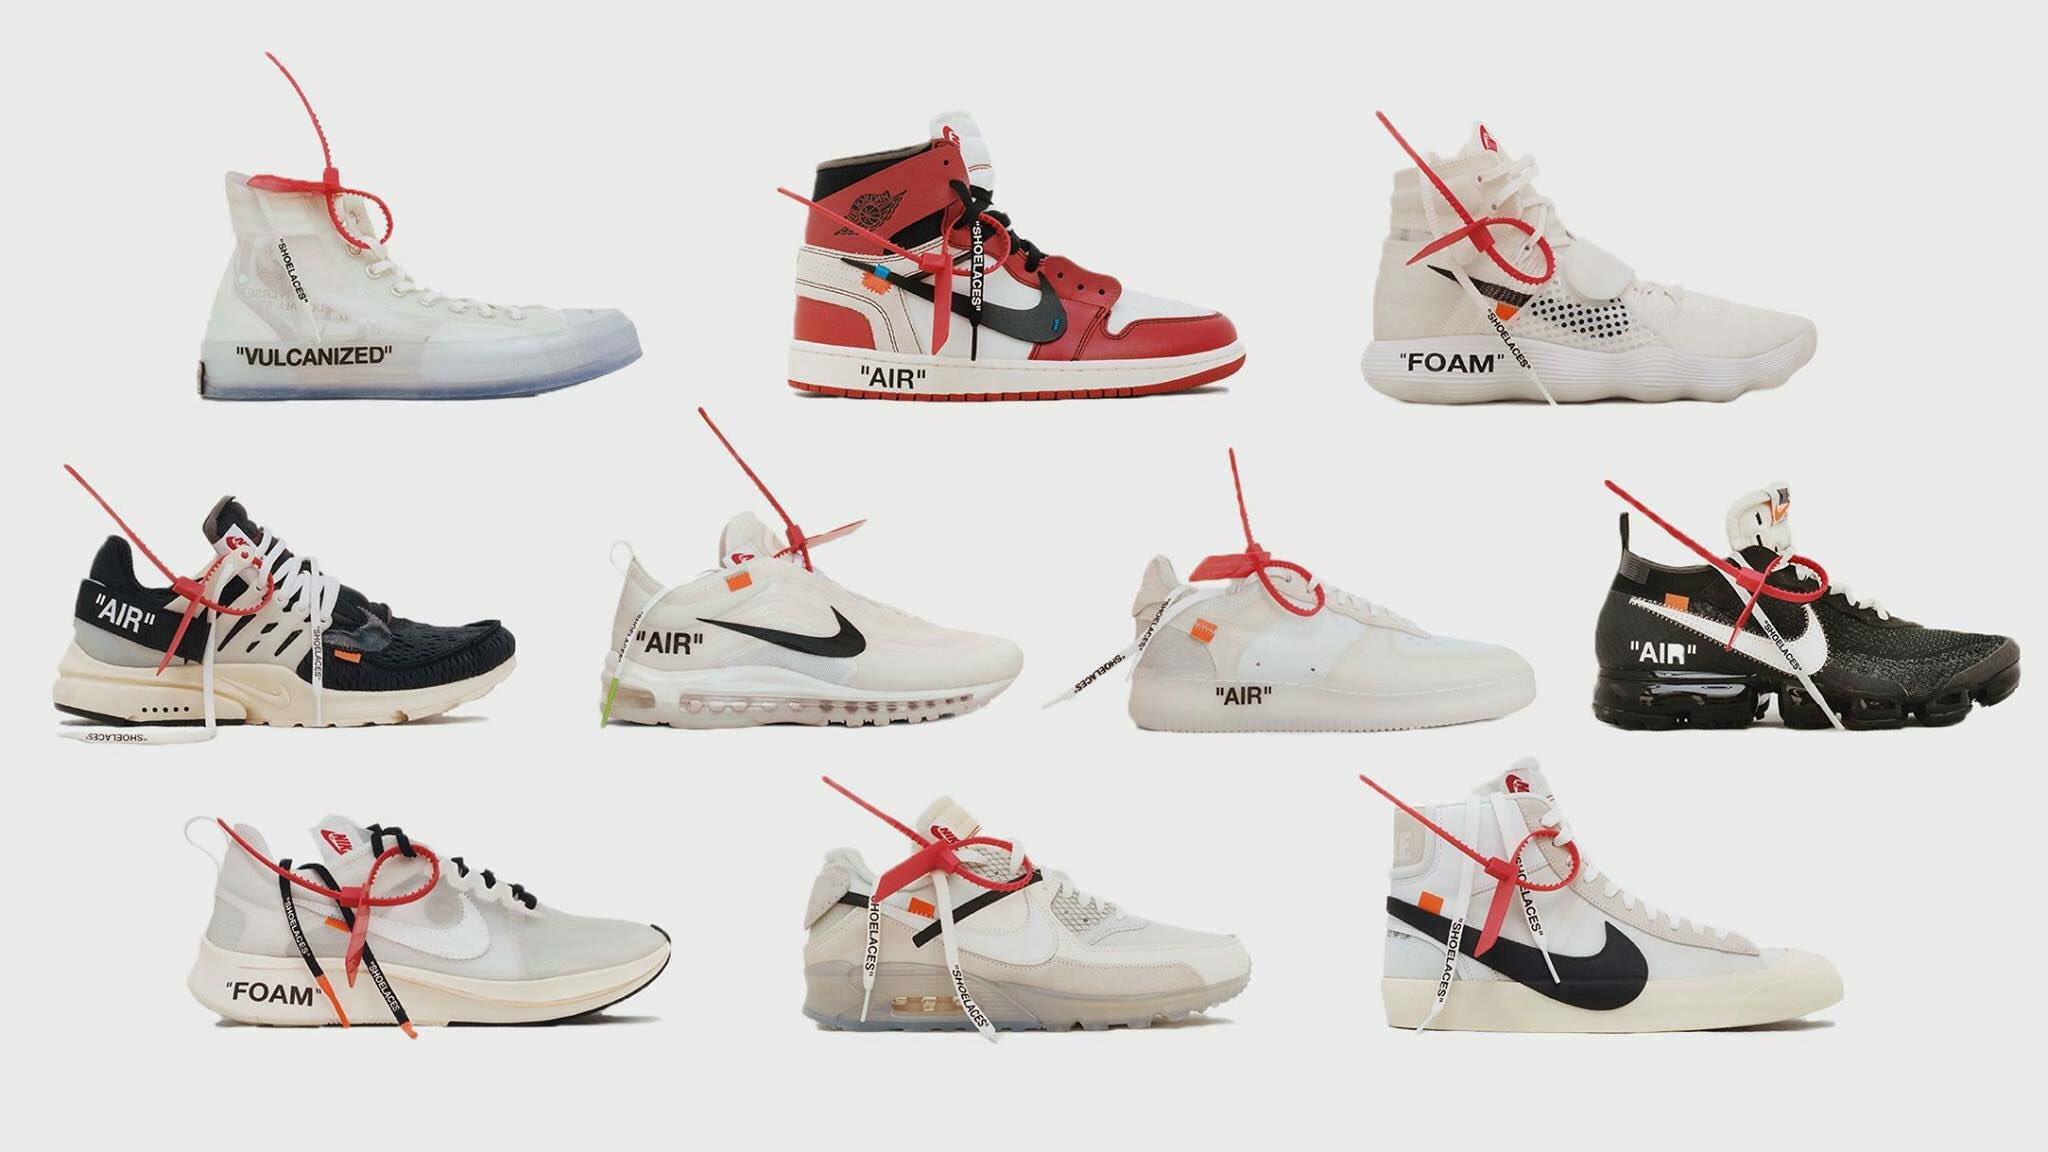 ccad055d Вторая часть коллекции GHOSTING состоит из моделей Nike Air Max 97, React  Hyperdunk, Air Force 1, Zoom Vaporfly и Chuck Taylor All-Star. Все модели  из ...